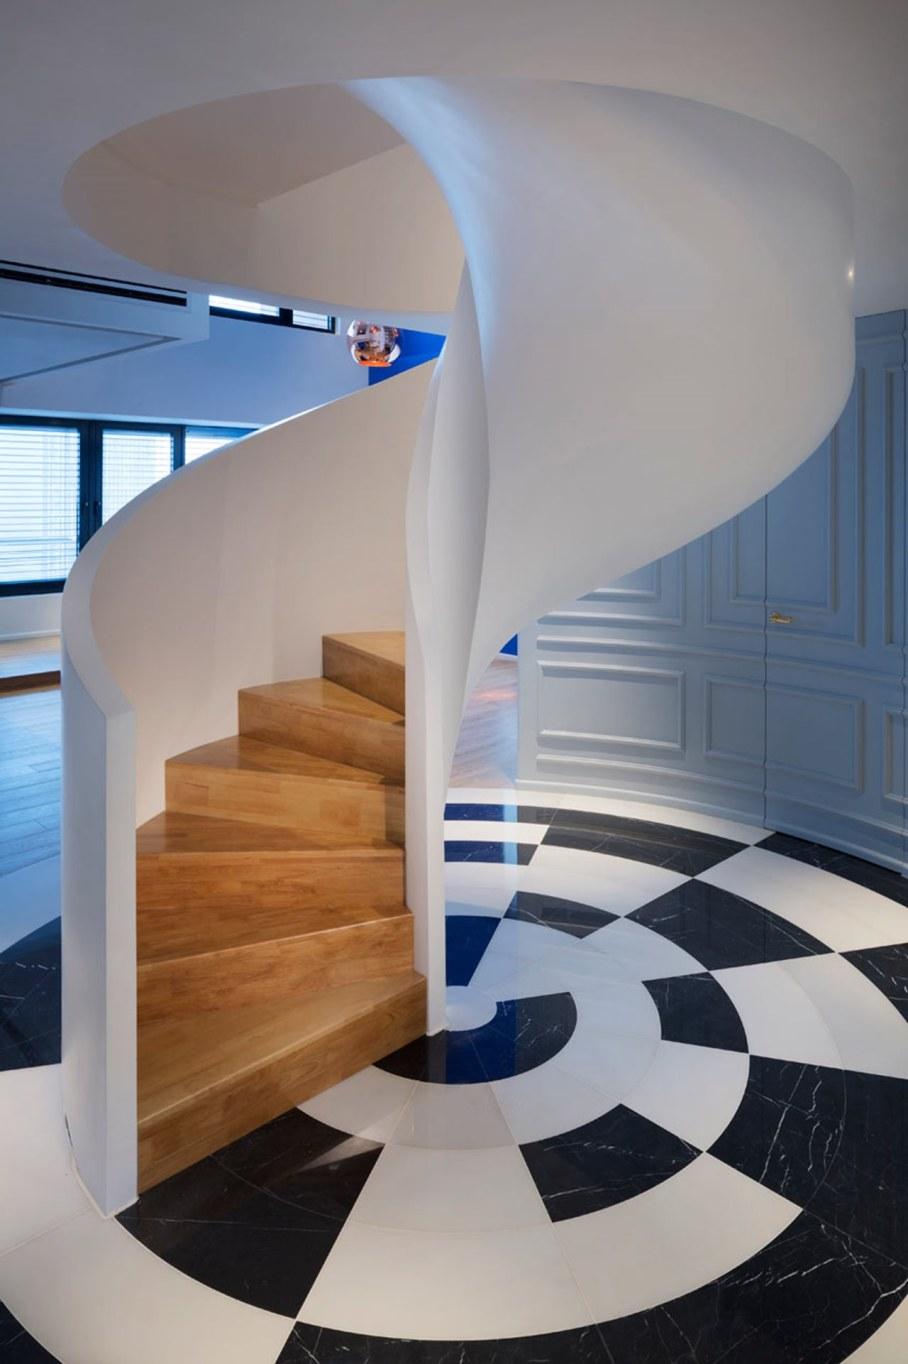 Blue Penthouse - Sculptural spiral staircase